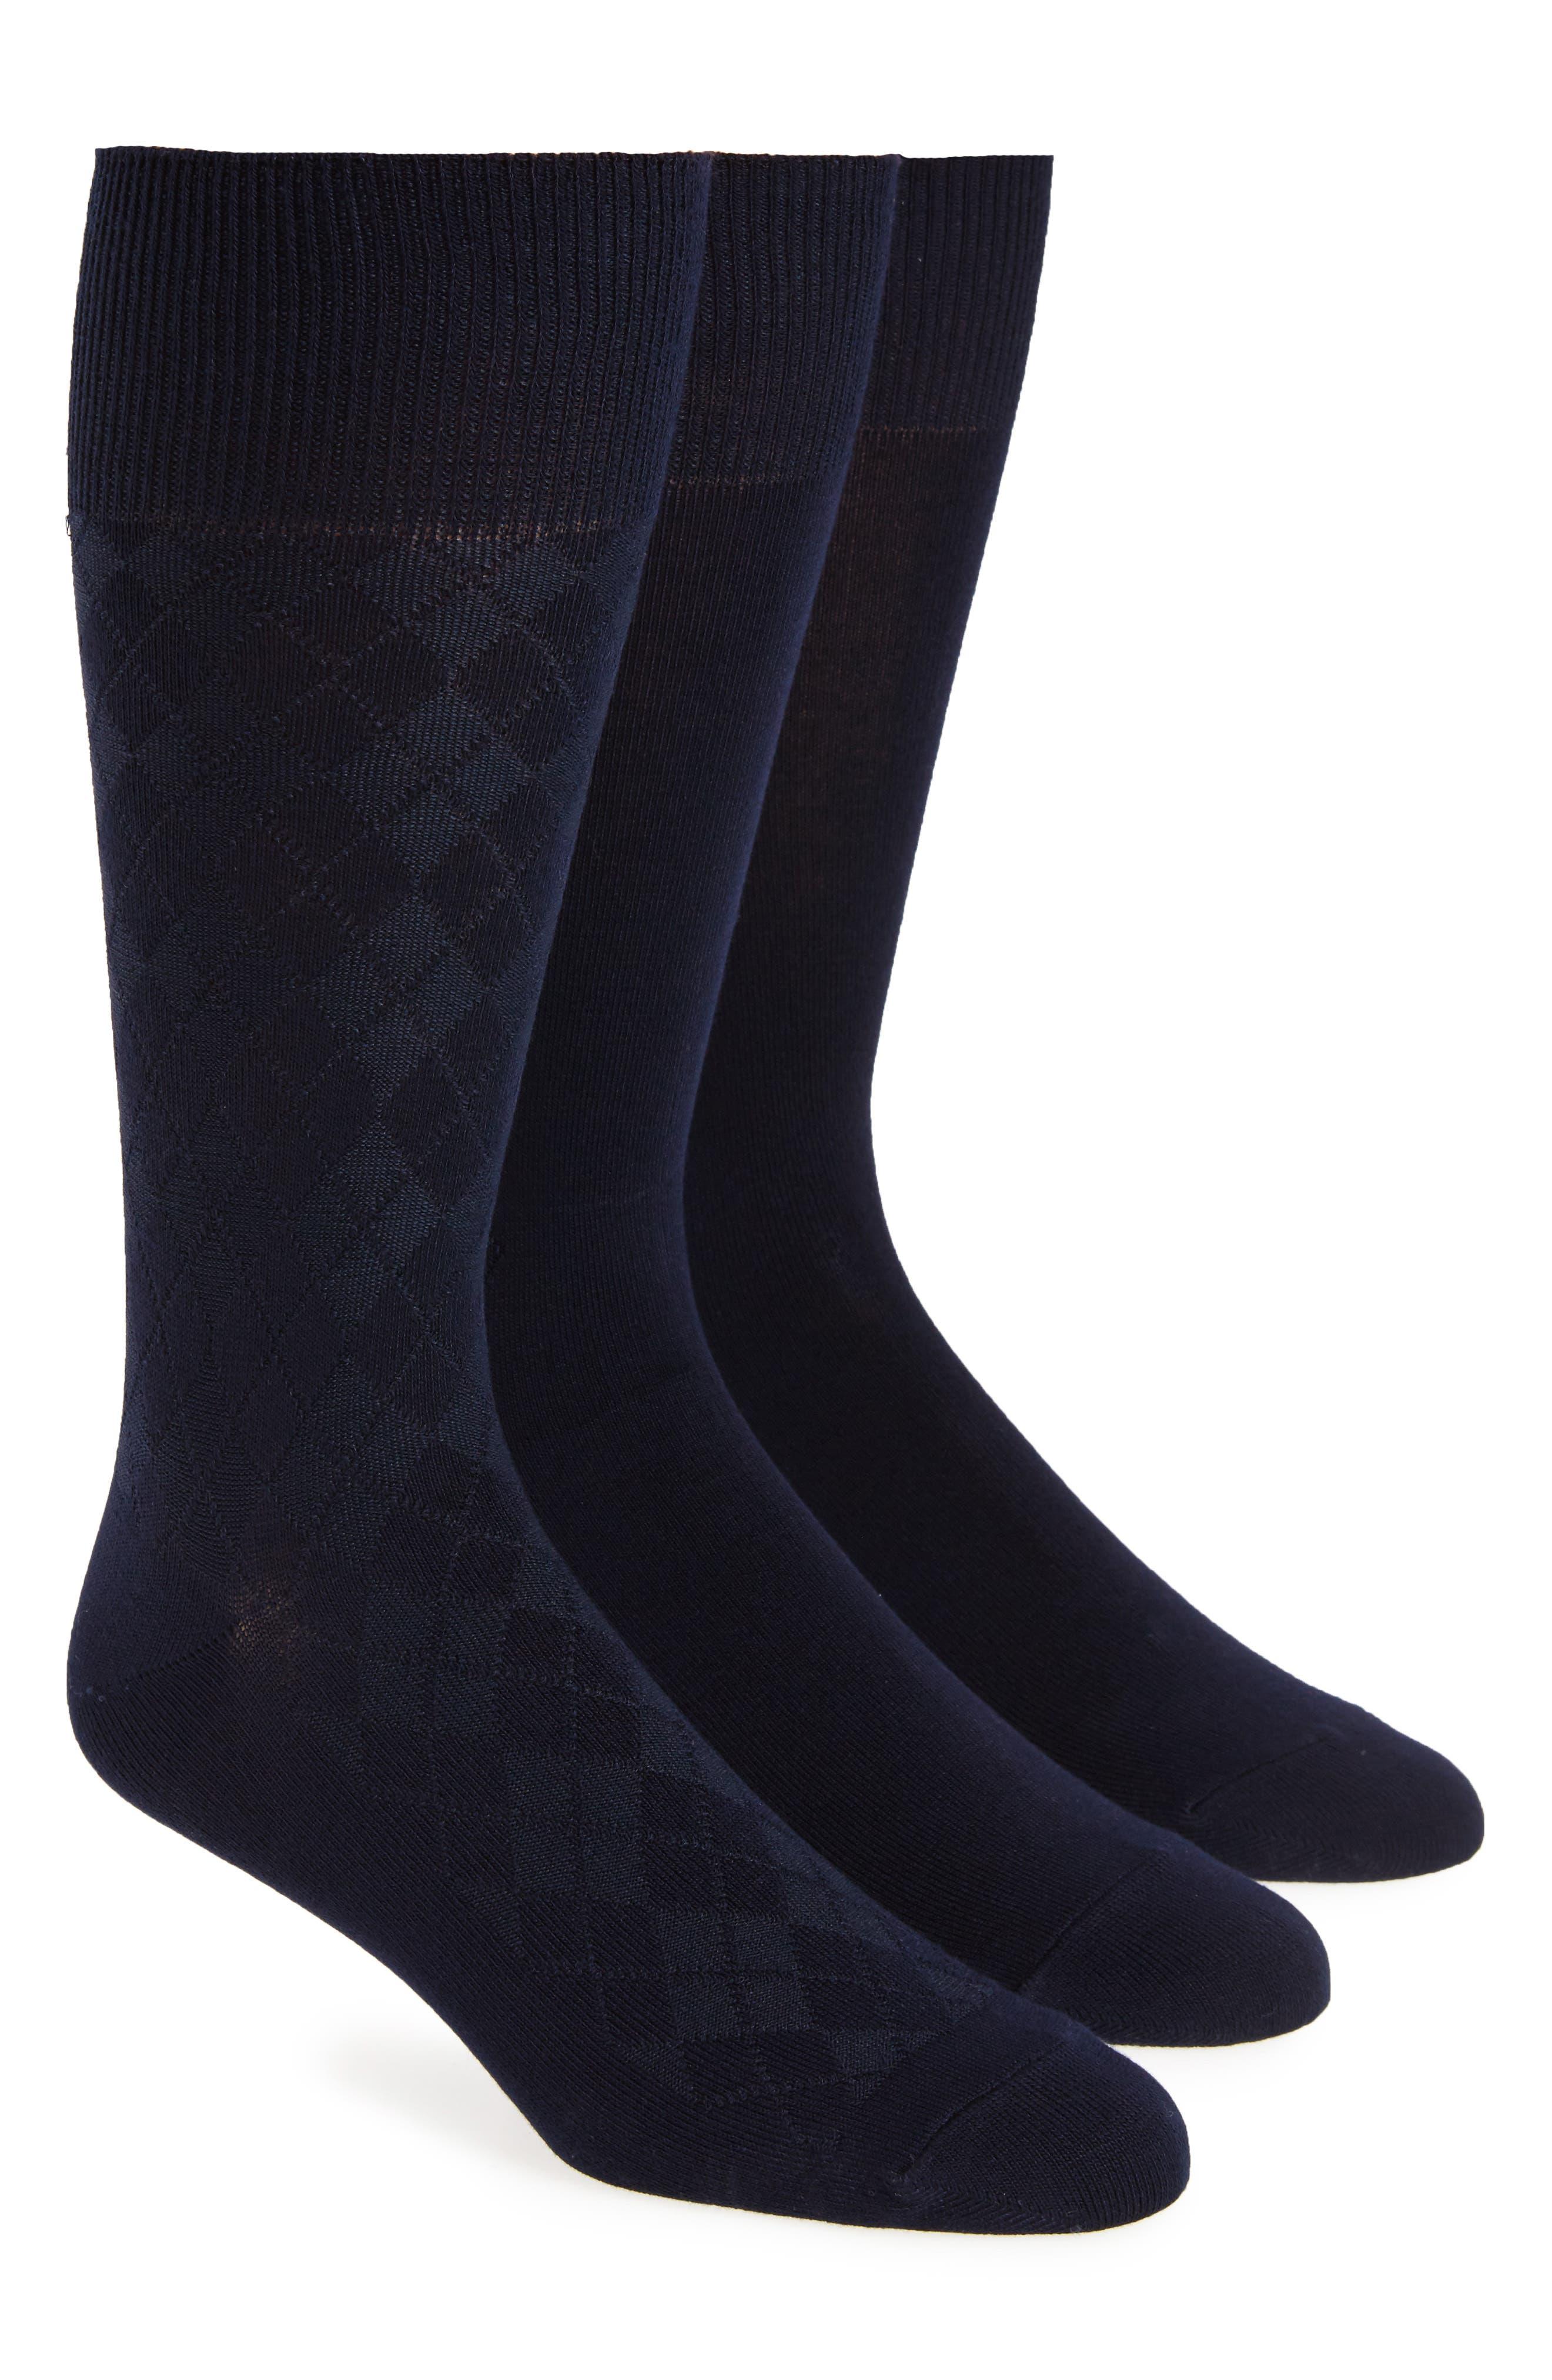 CALVIN KLEIN, 3-Pack Socks, Main thumbnail 1, color, NAVY